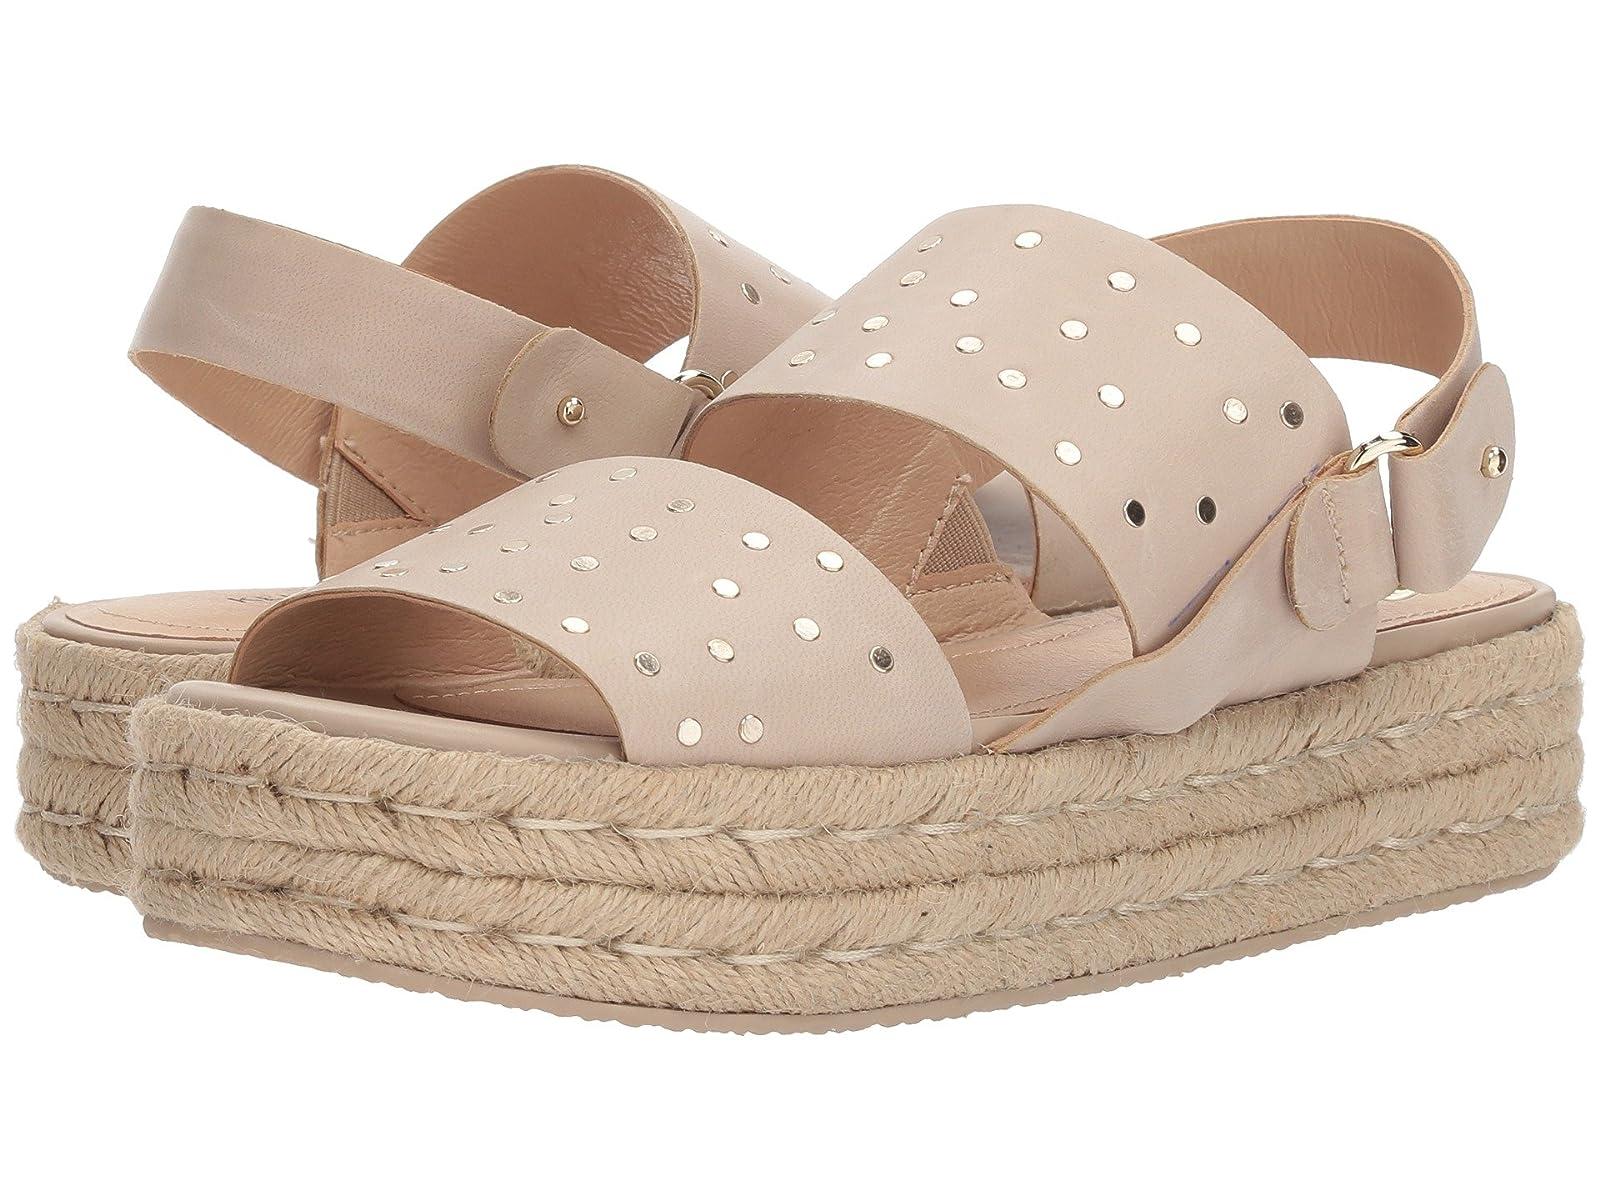 Kelsi Dagger Brooklyn Devon Espadrille SandalCheap and distinctive eye-catching shoes